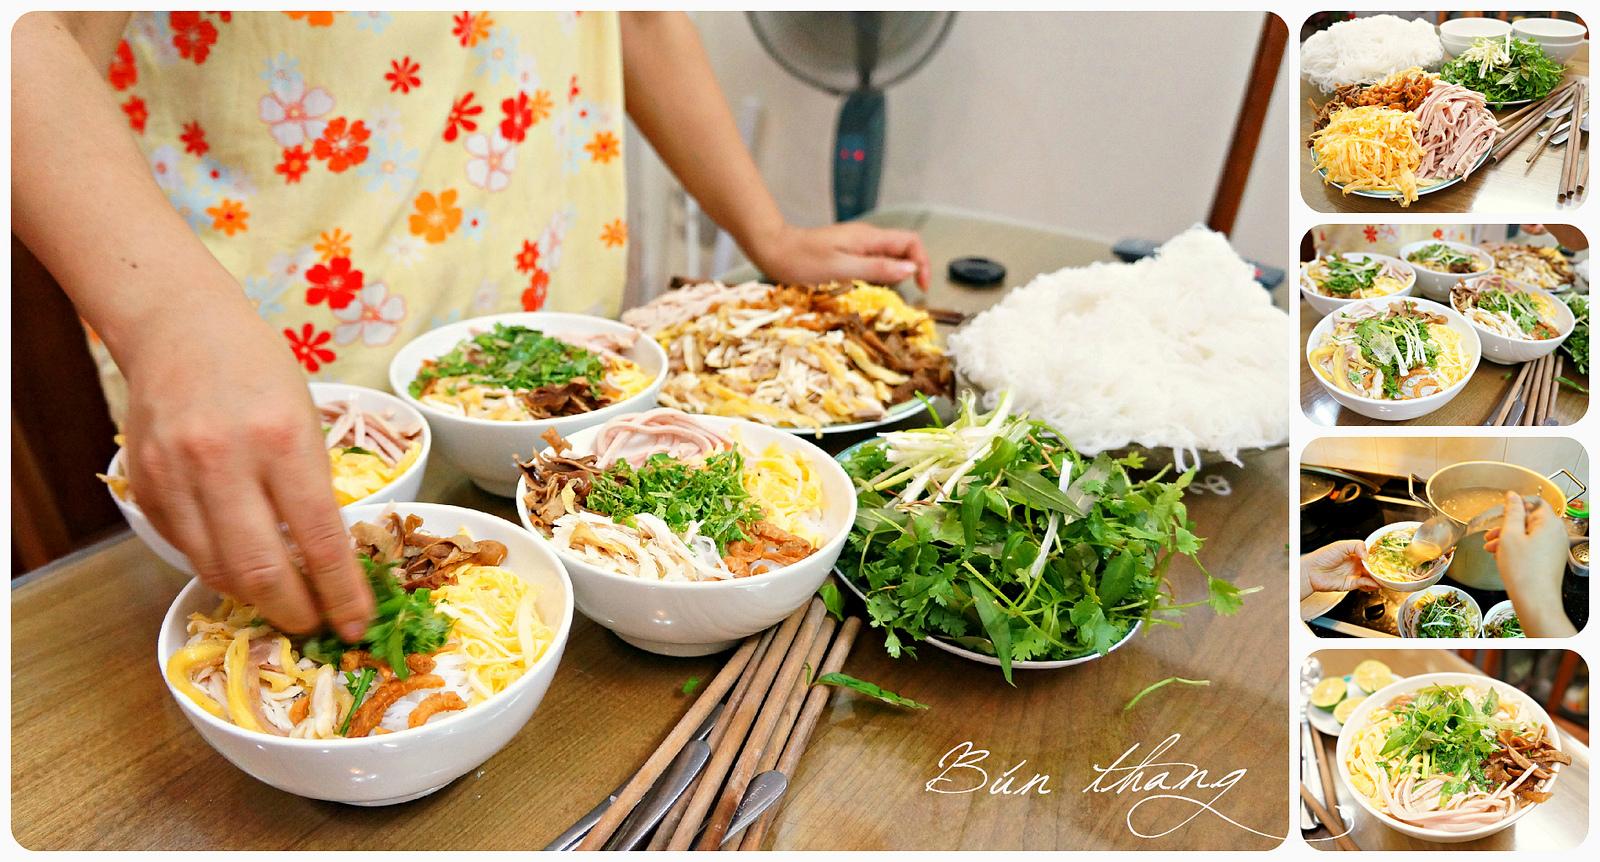 How to make Bun Thang - Hanoi cuisine tour